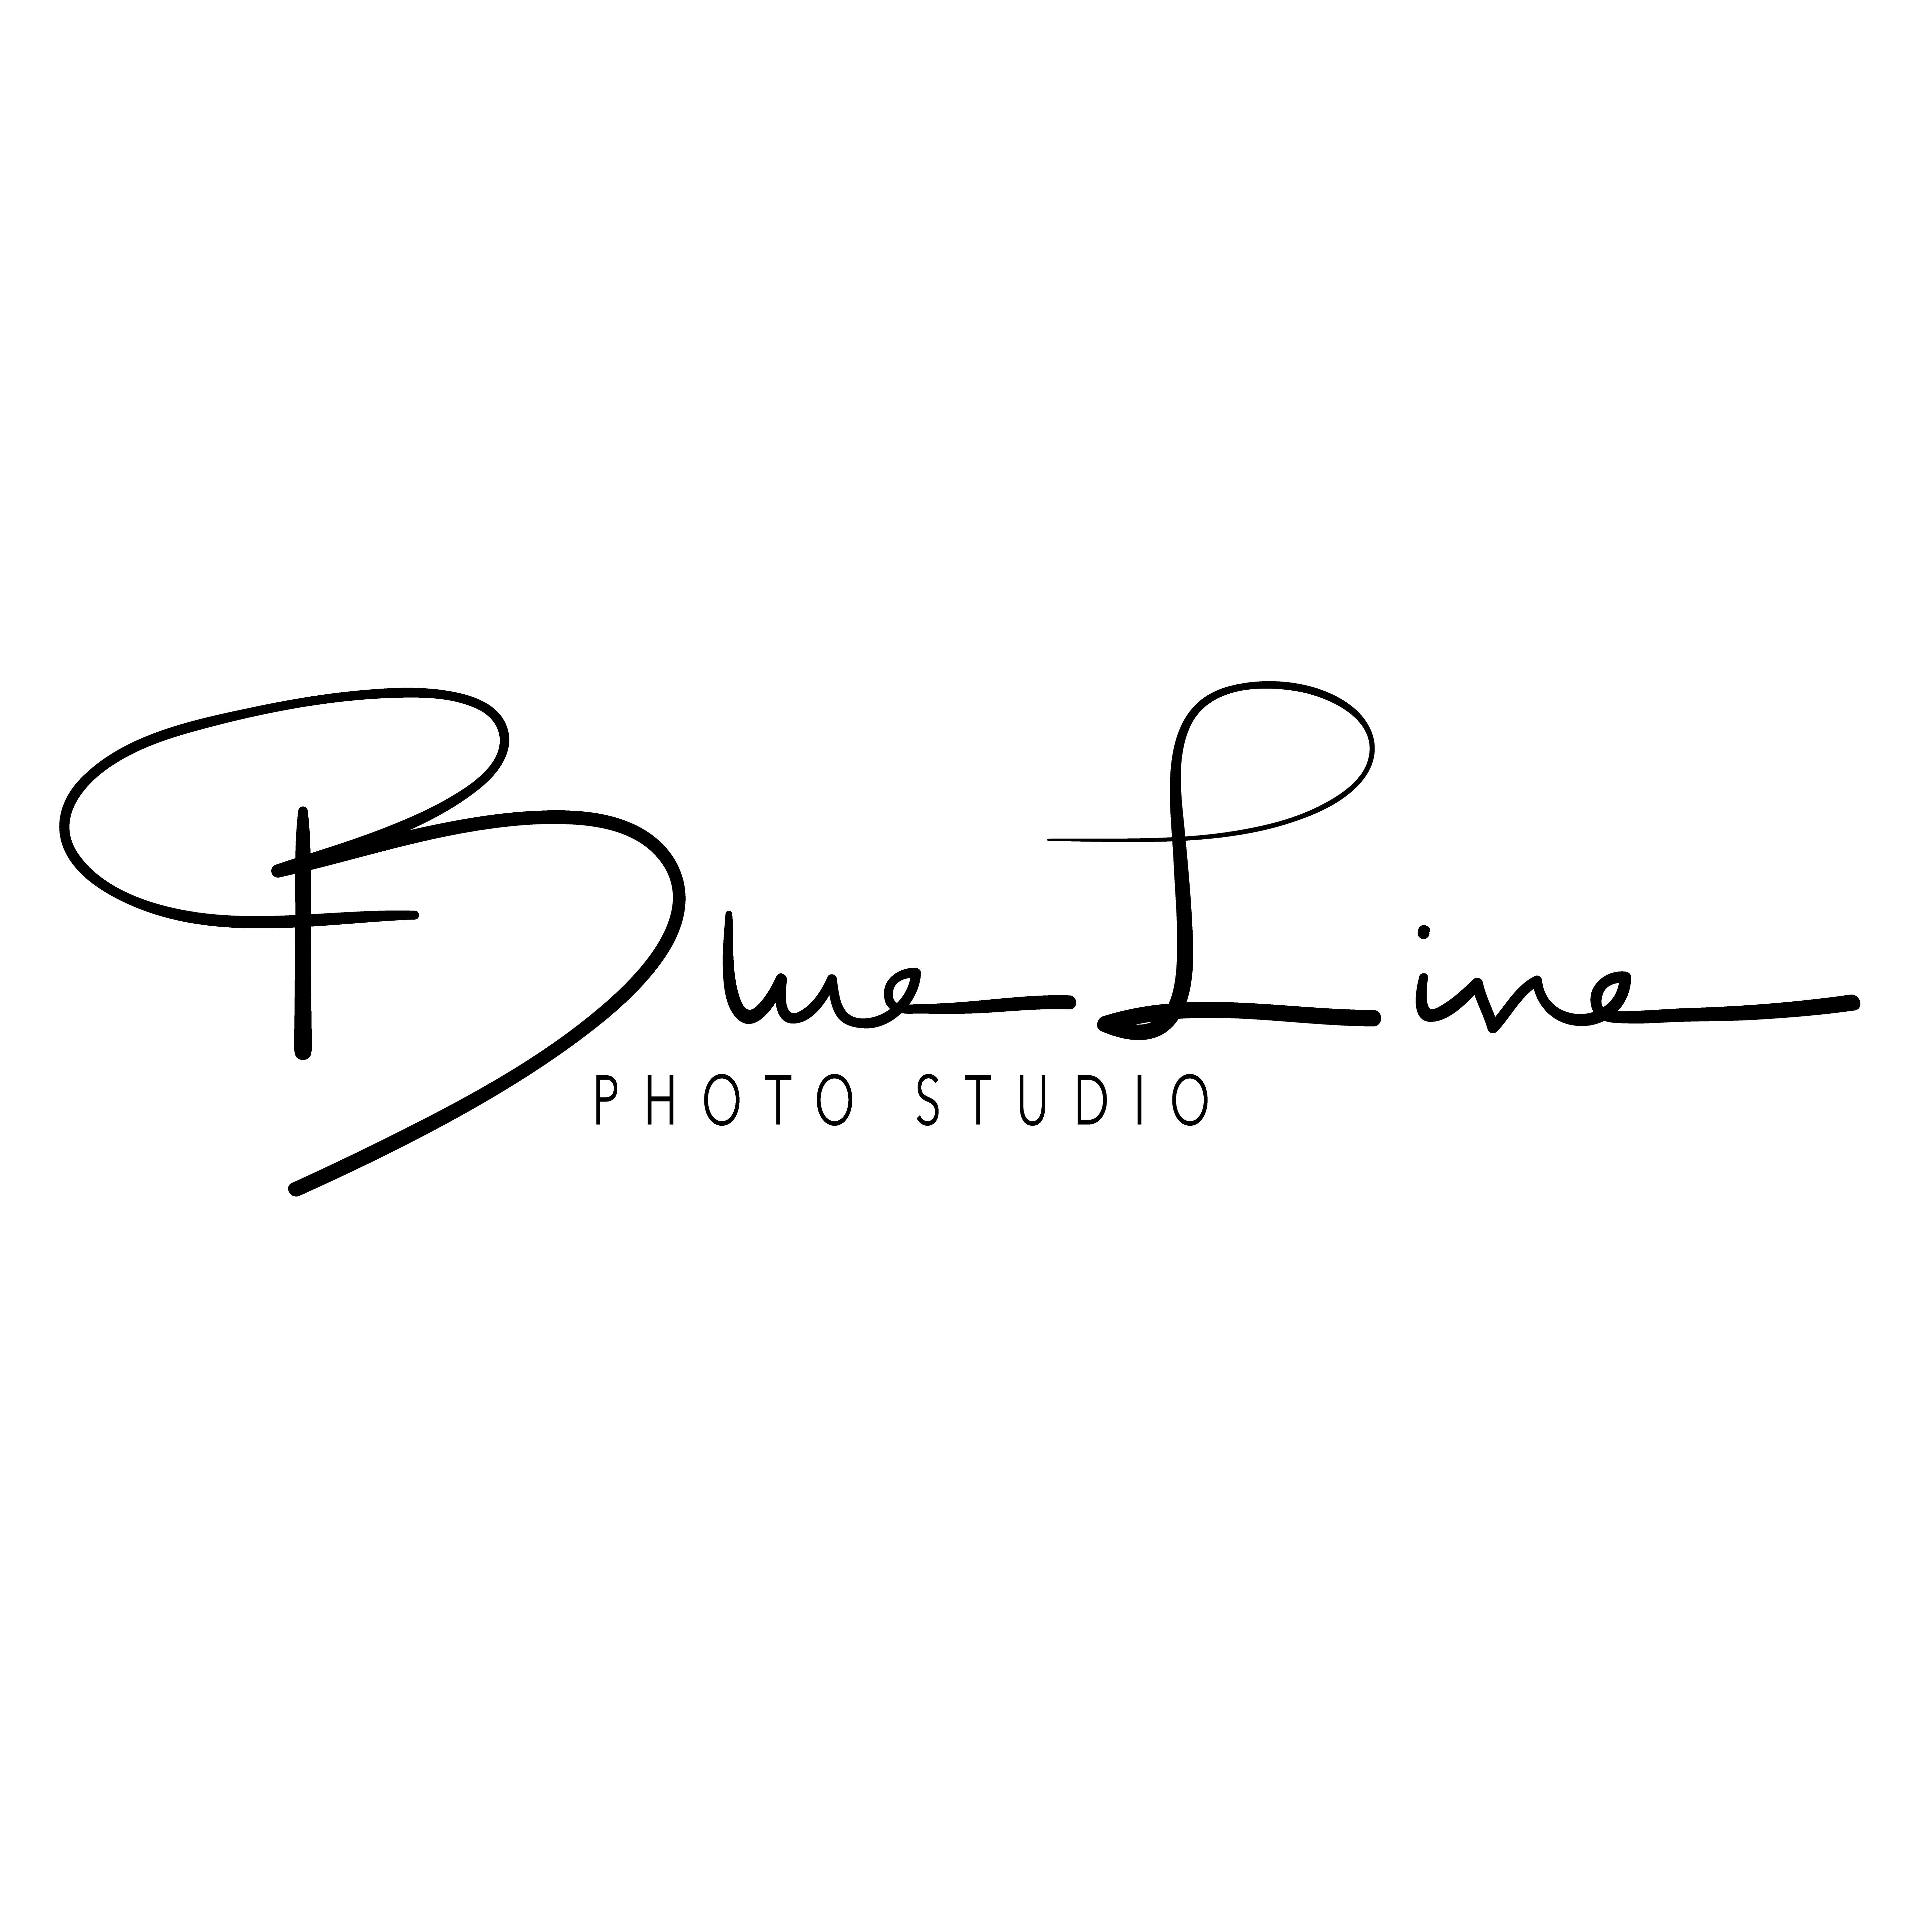 Blue Line Photo Studio